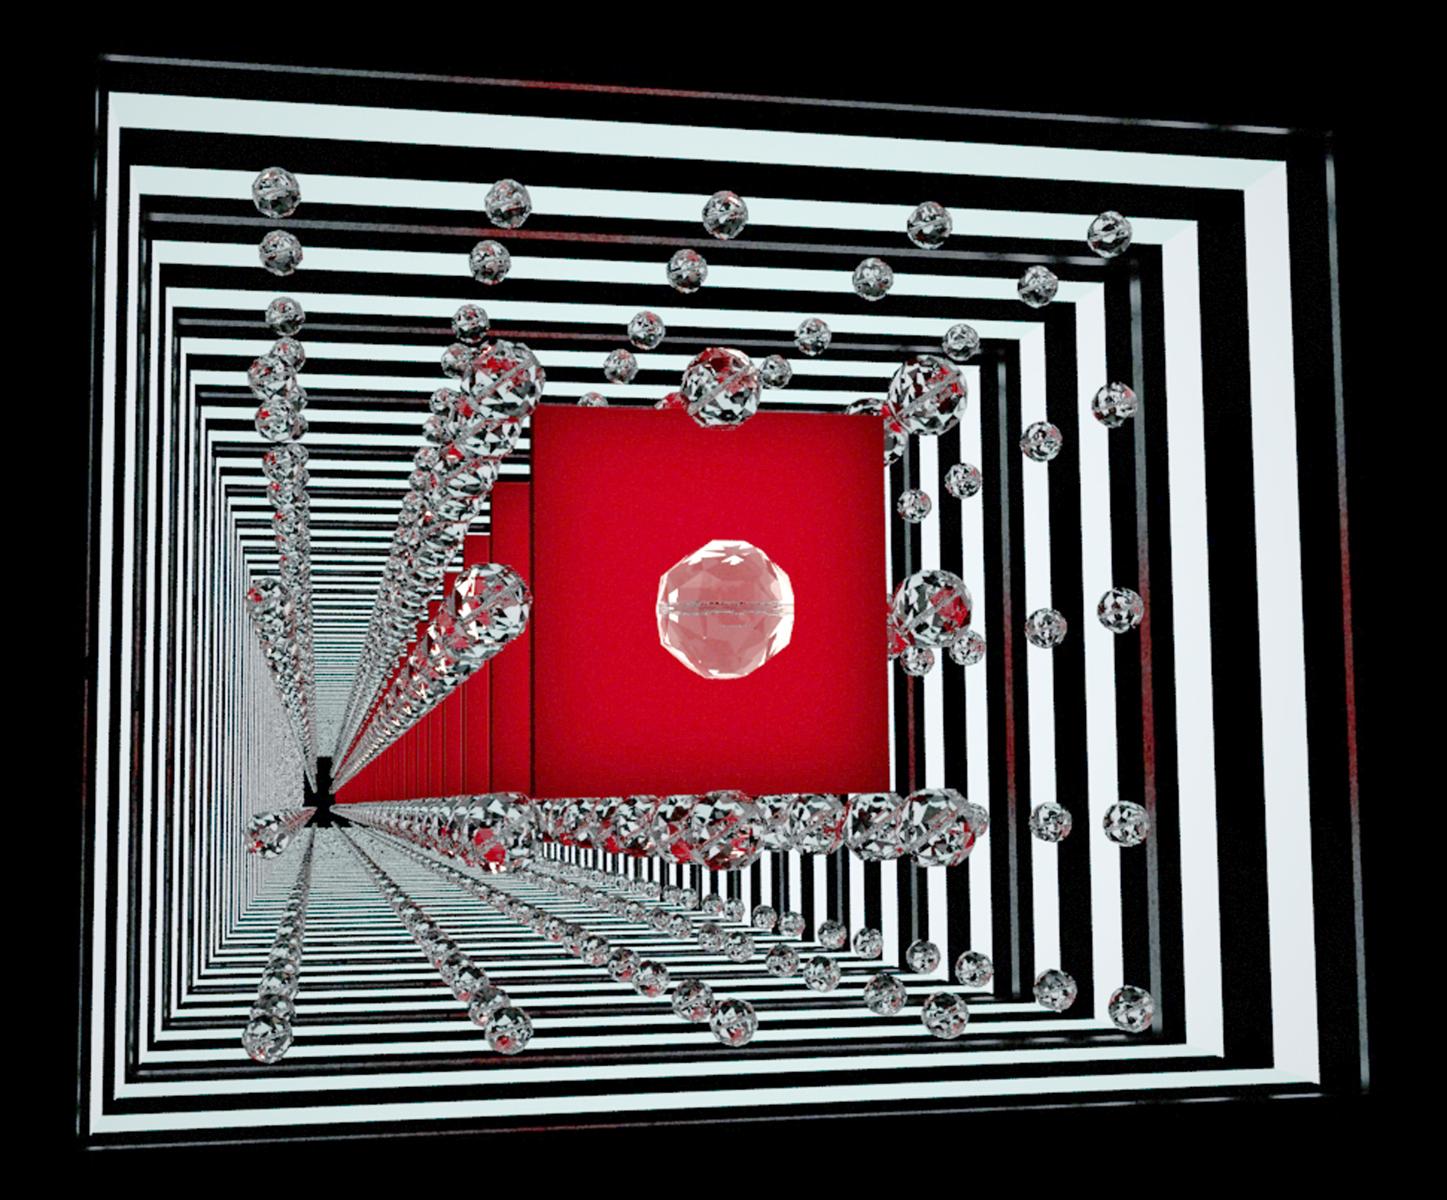 Amazing Mirror Reflections By Stanislav Sapukhin